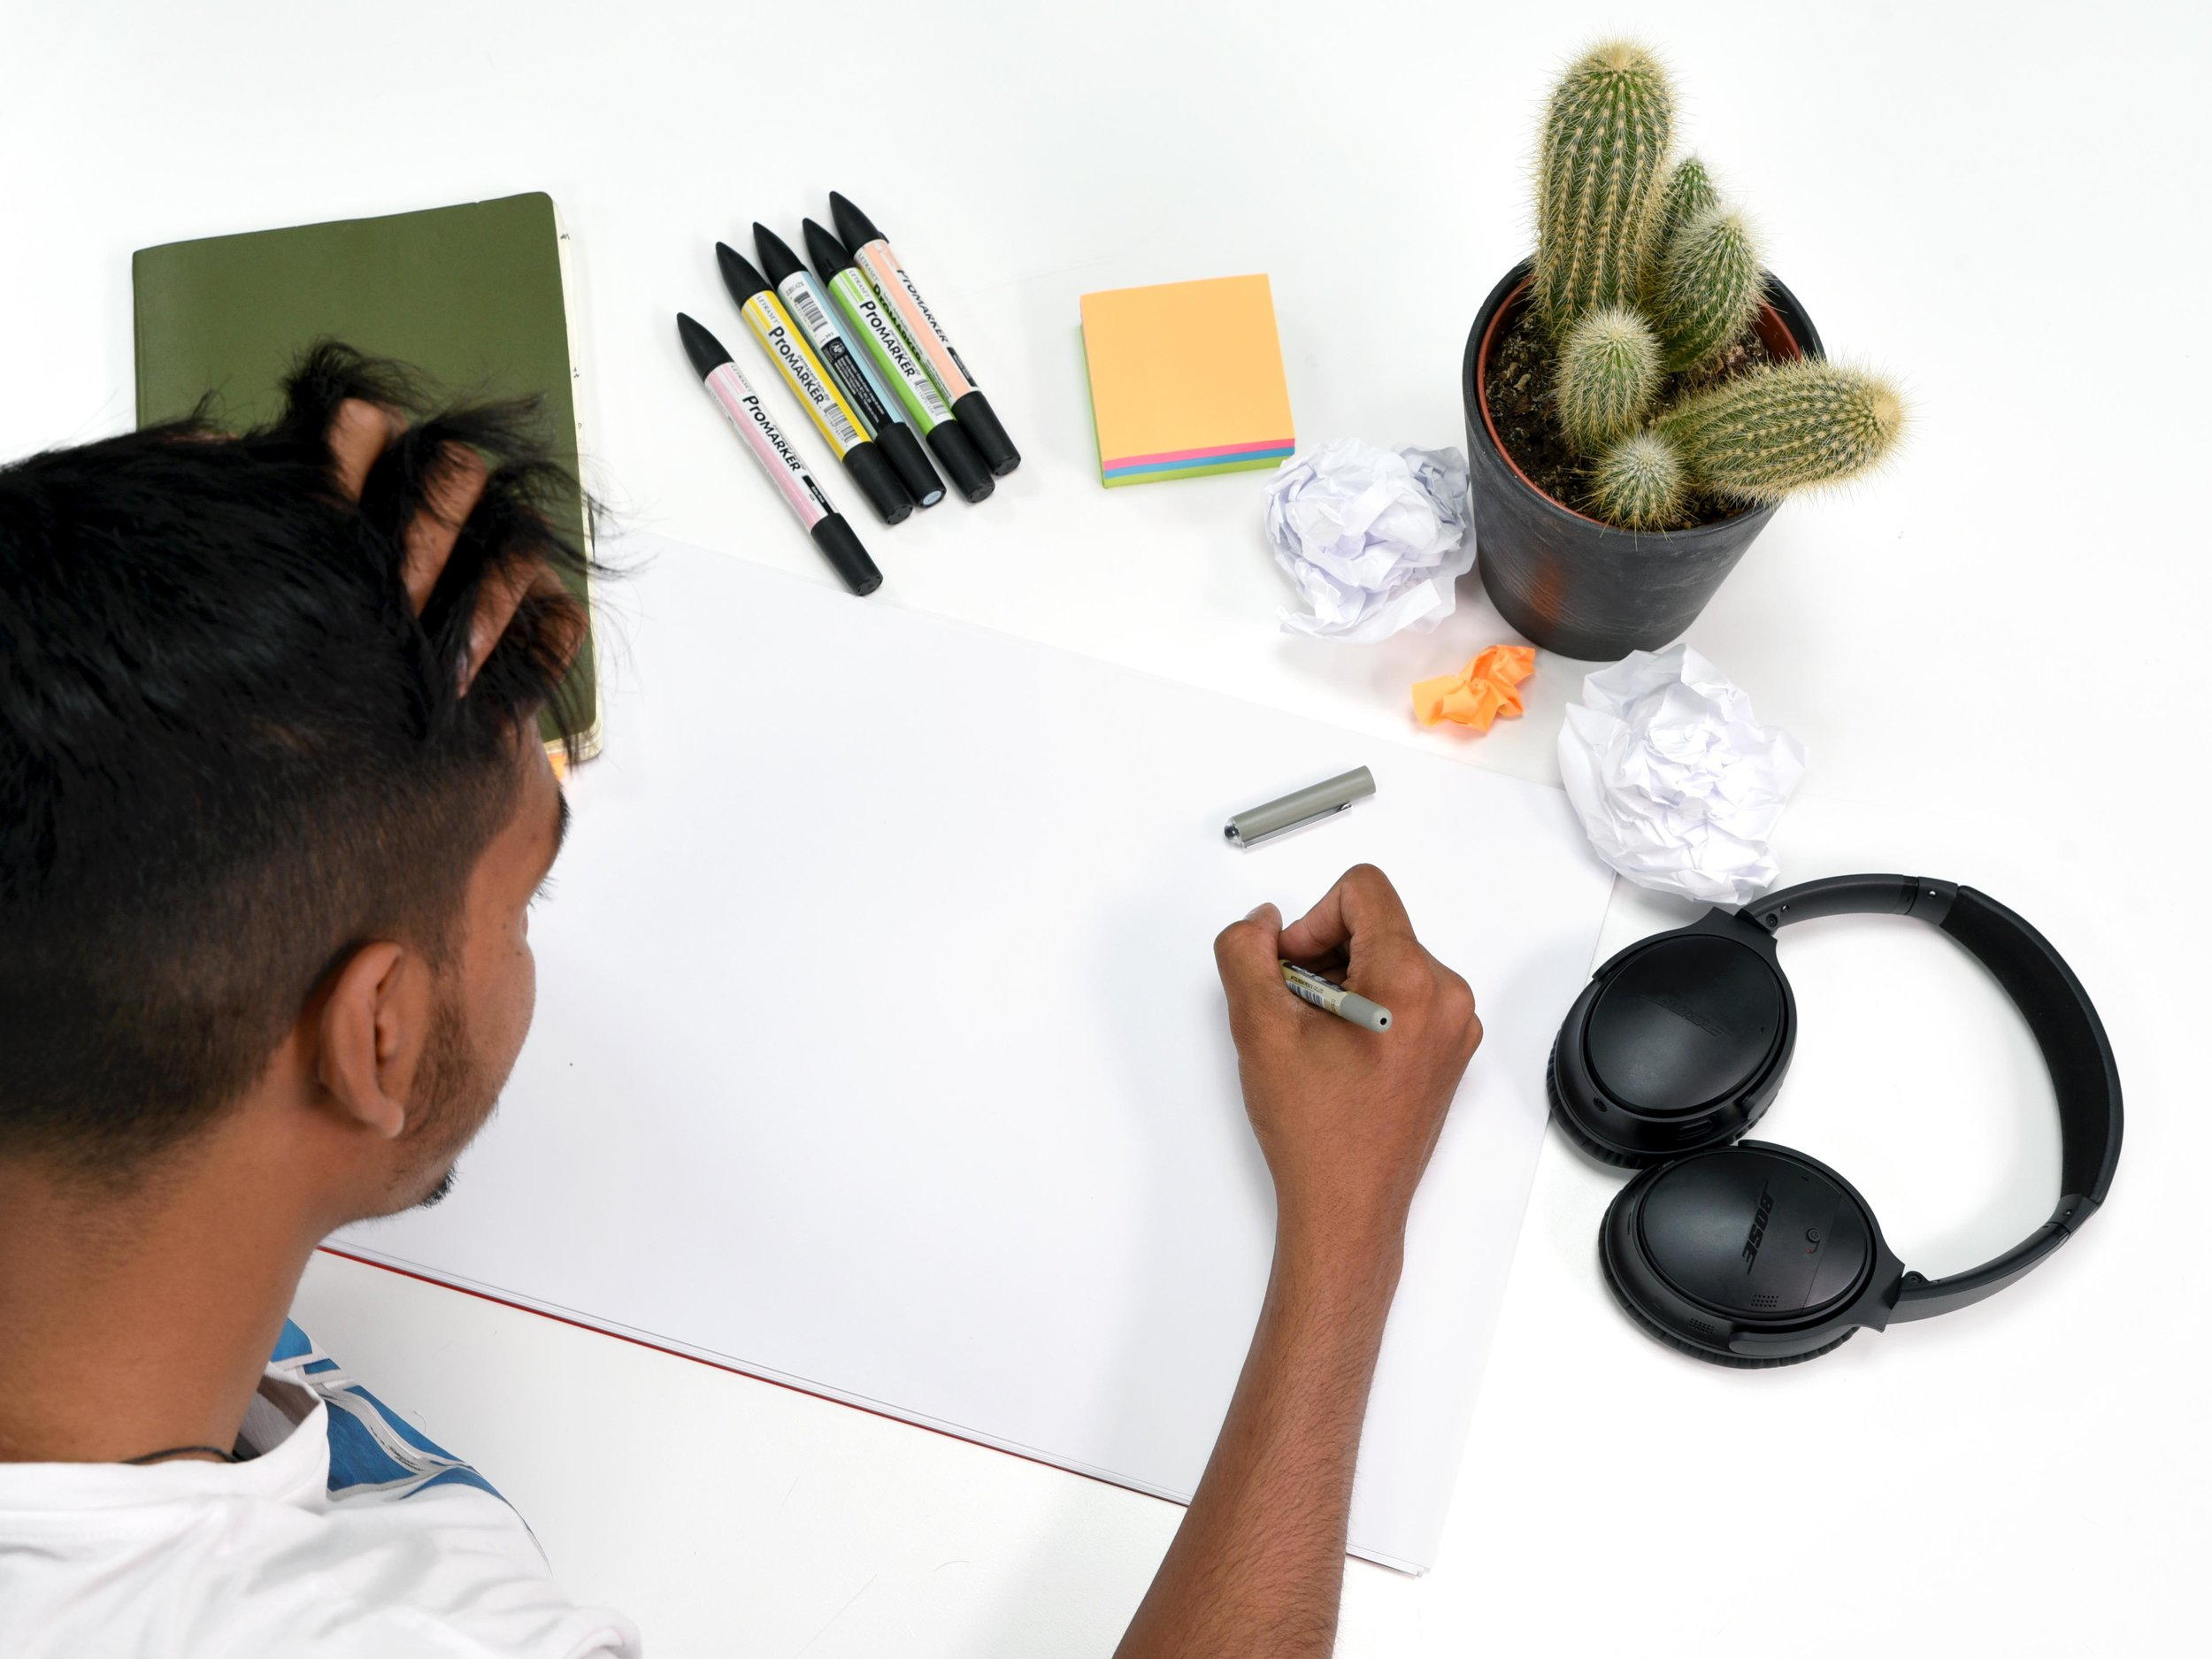 Designer-thinking-with-creative-writers-block-at-designworks-2.jpg